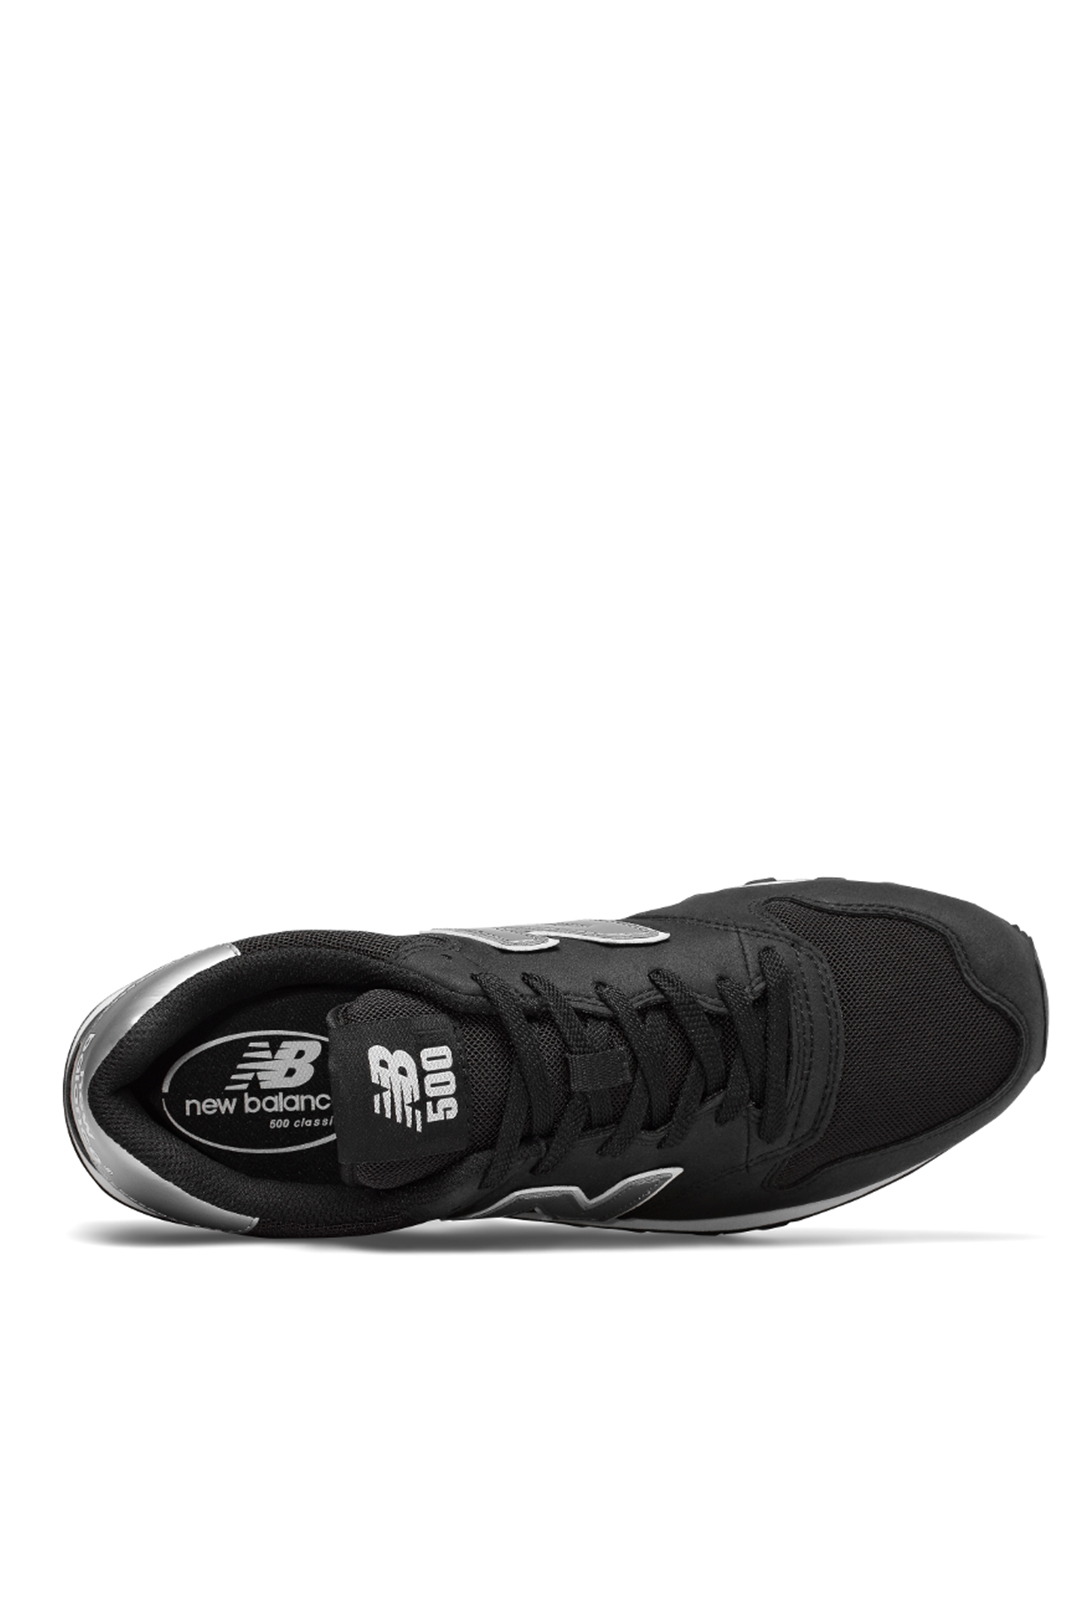 Baskets / Sport  New balance GM500KSW KSW